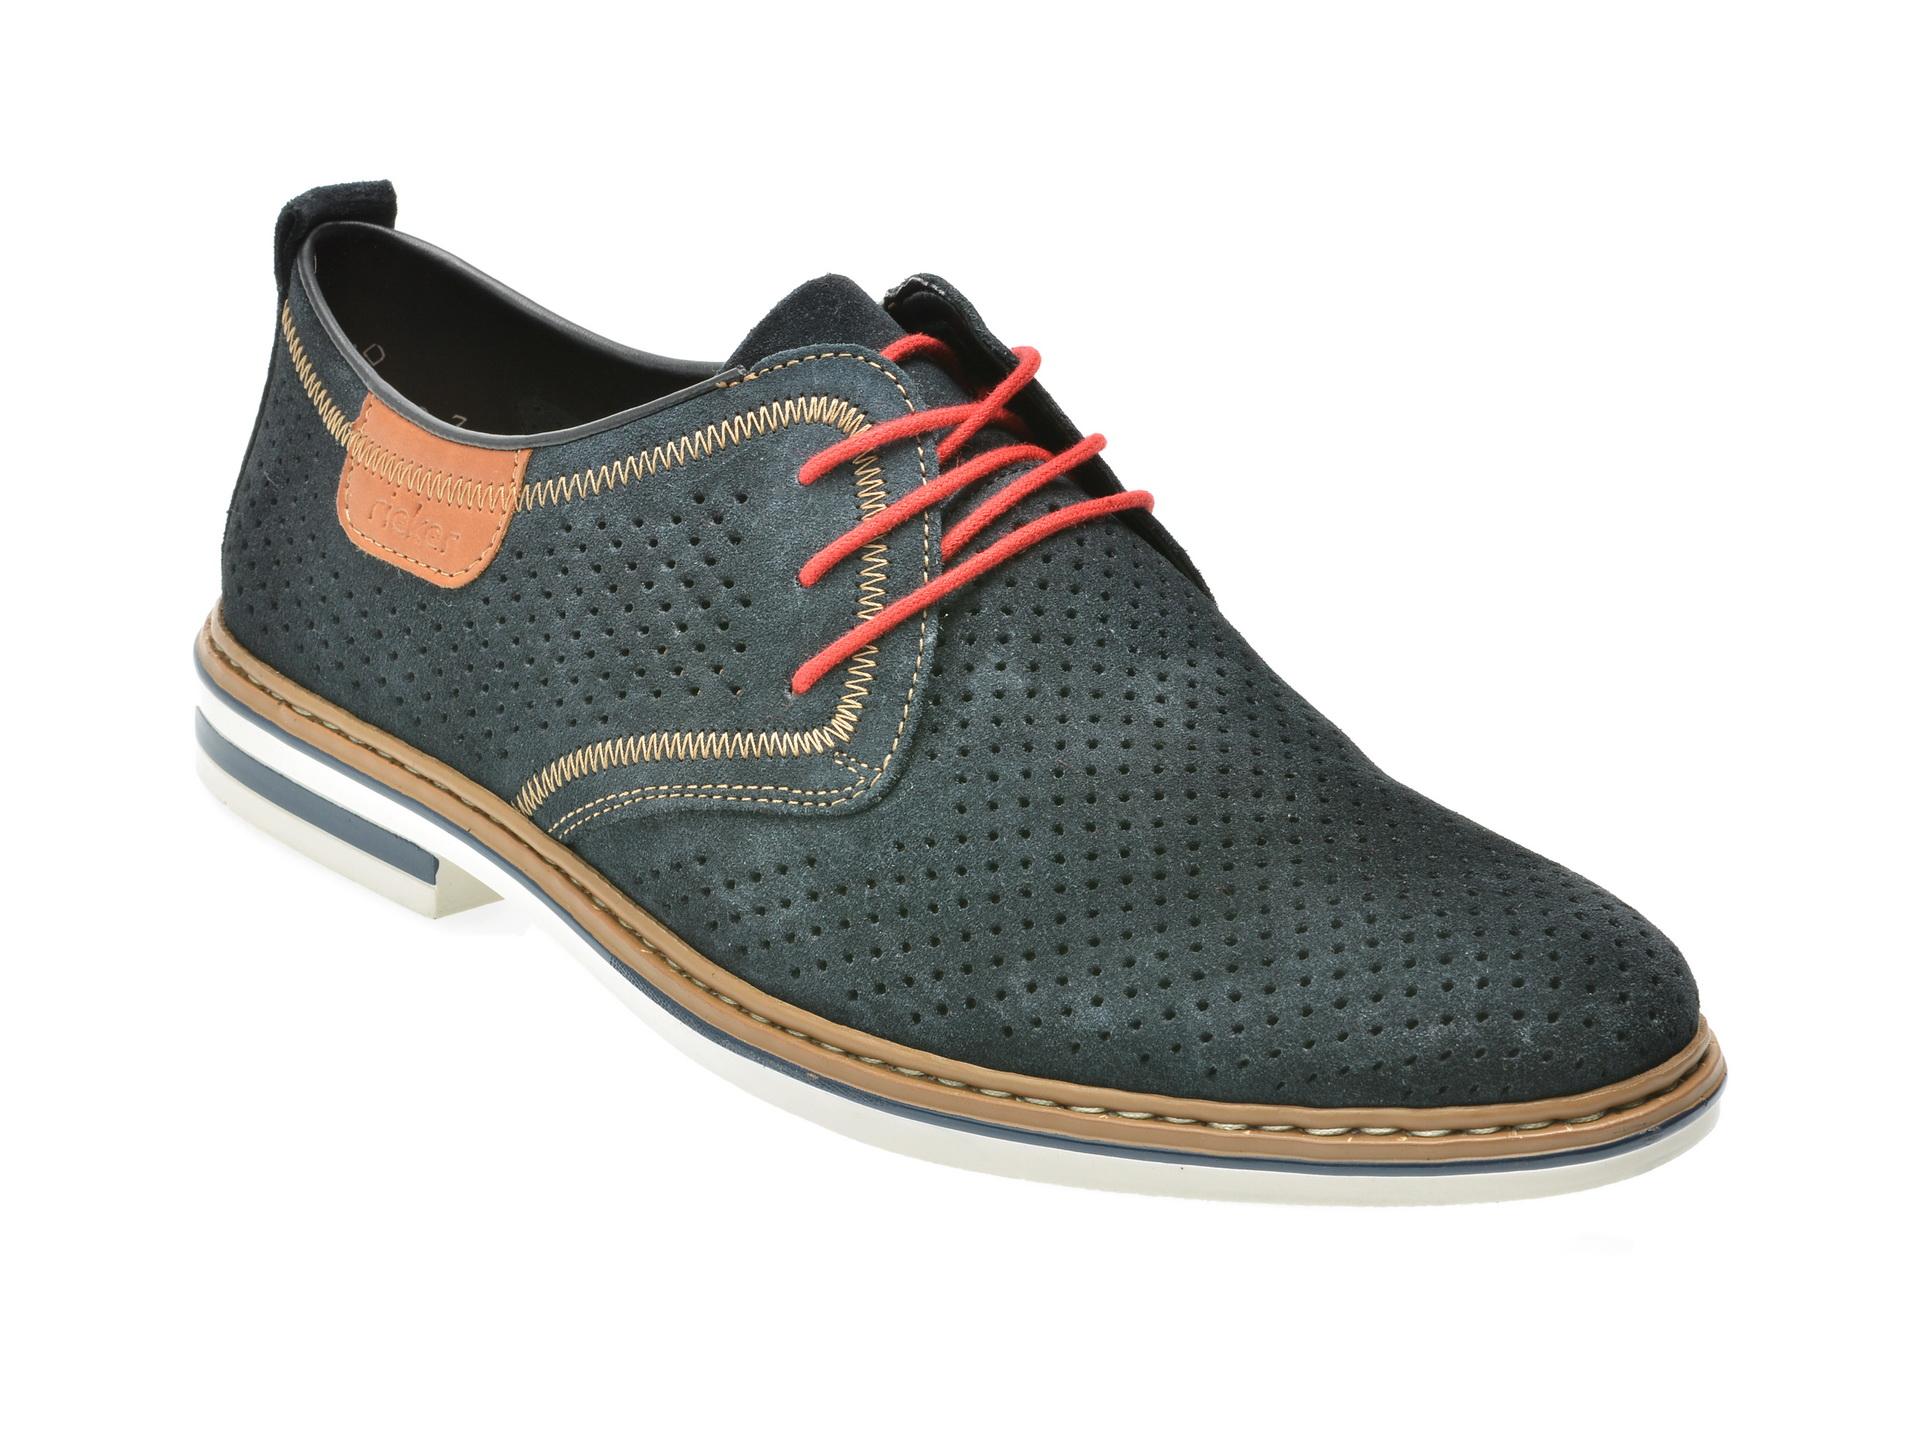 Pantofi RIEKER bleumarin, B1406, din piele intoarsa